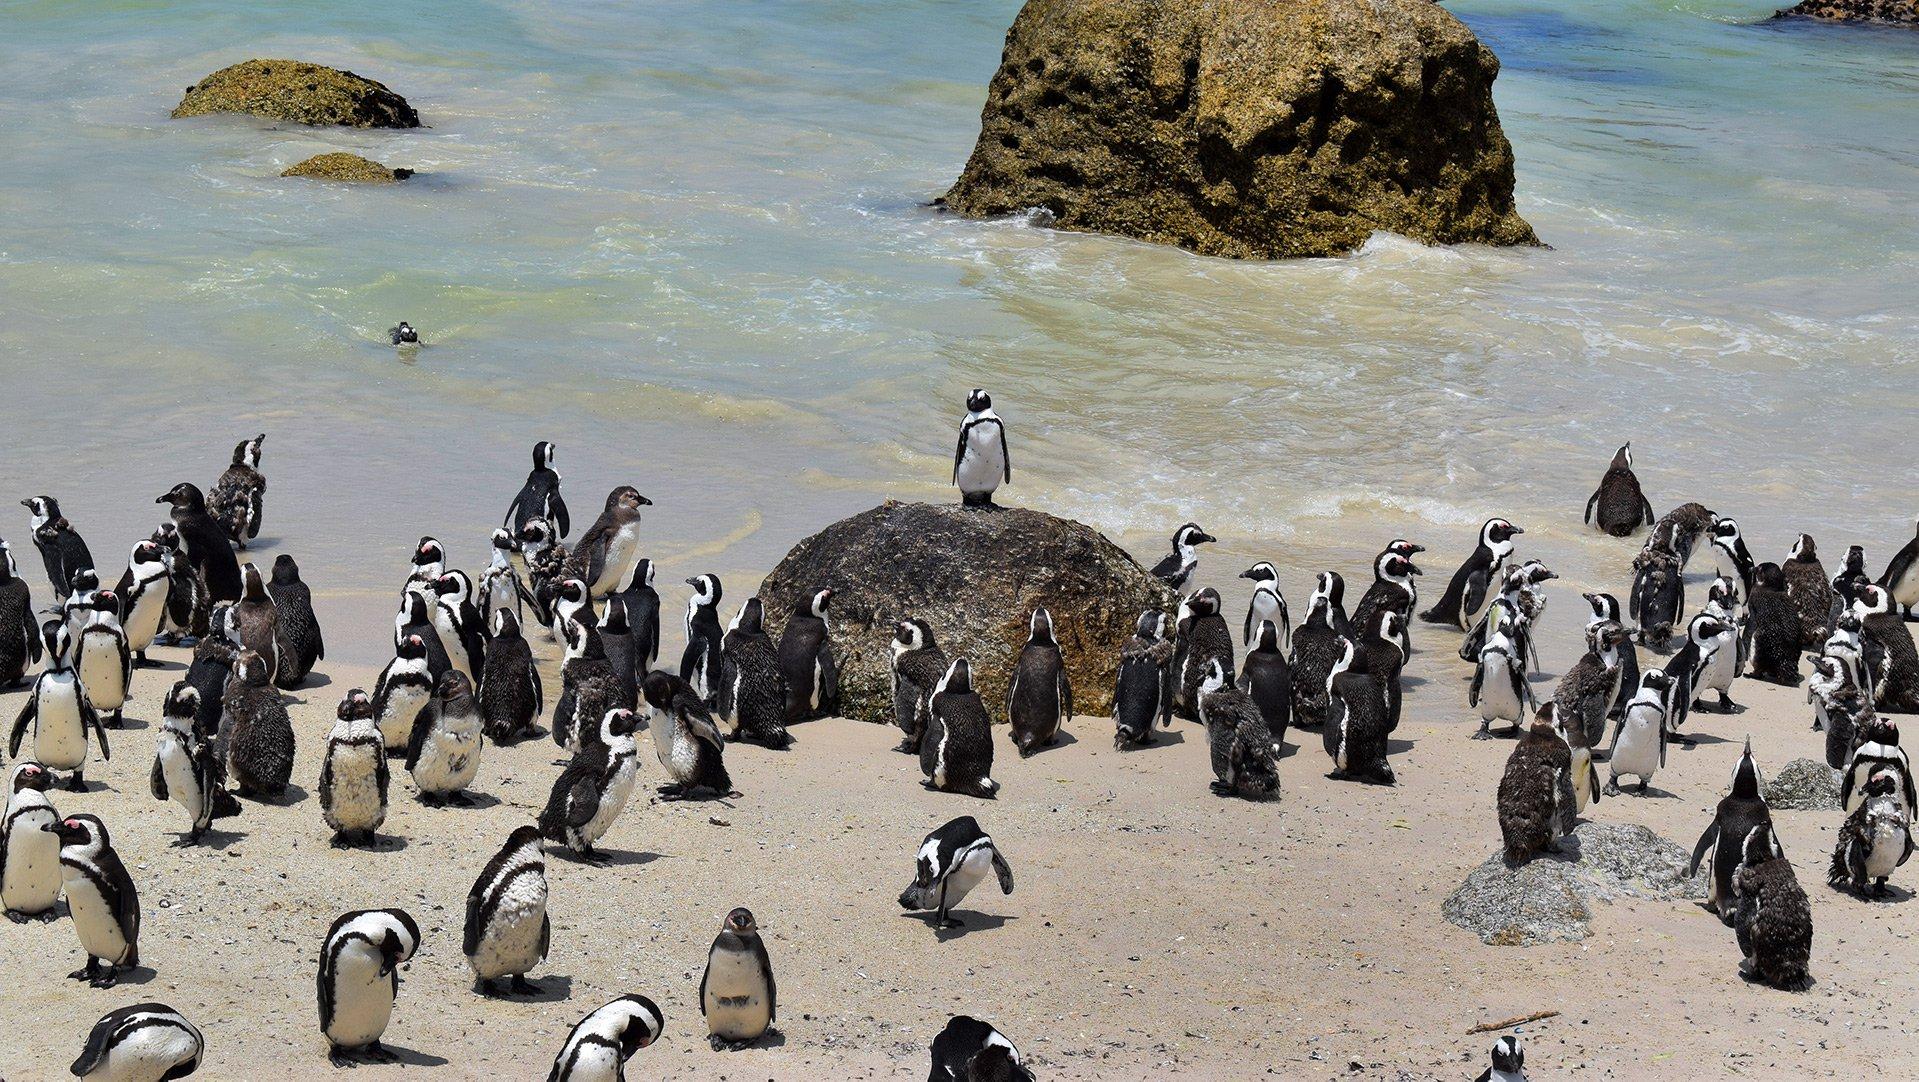 48-52 pinguin_1920x1080.jpg